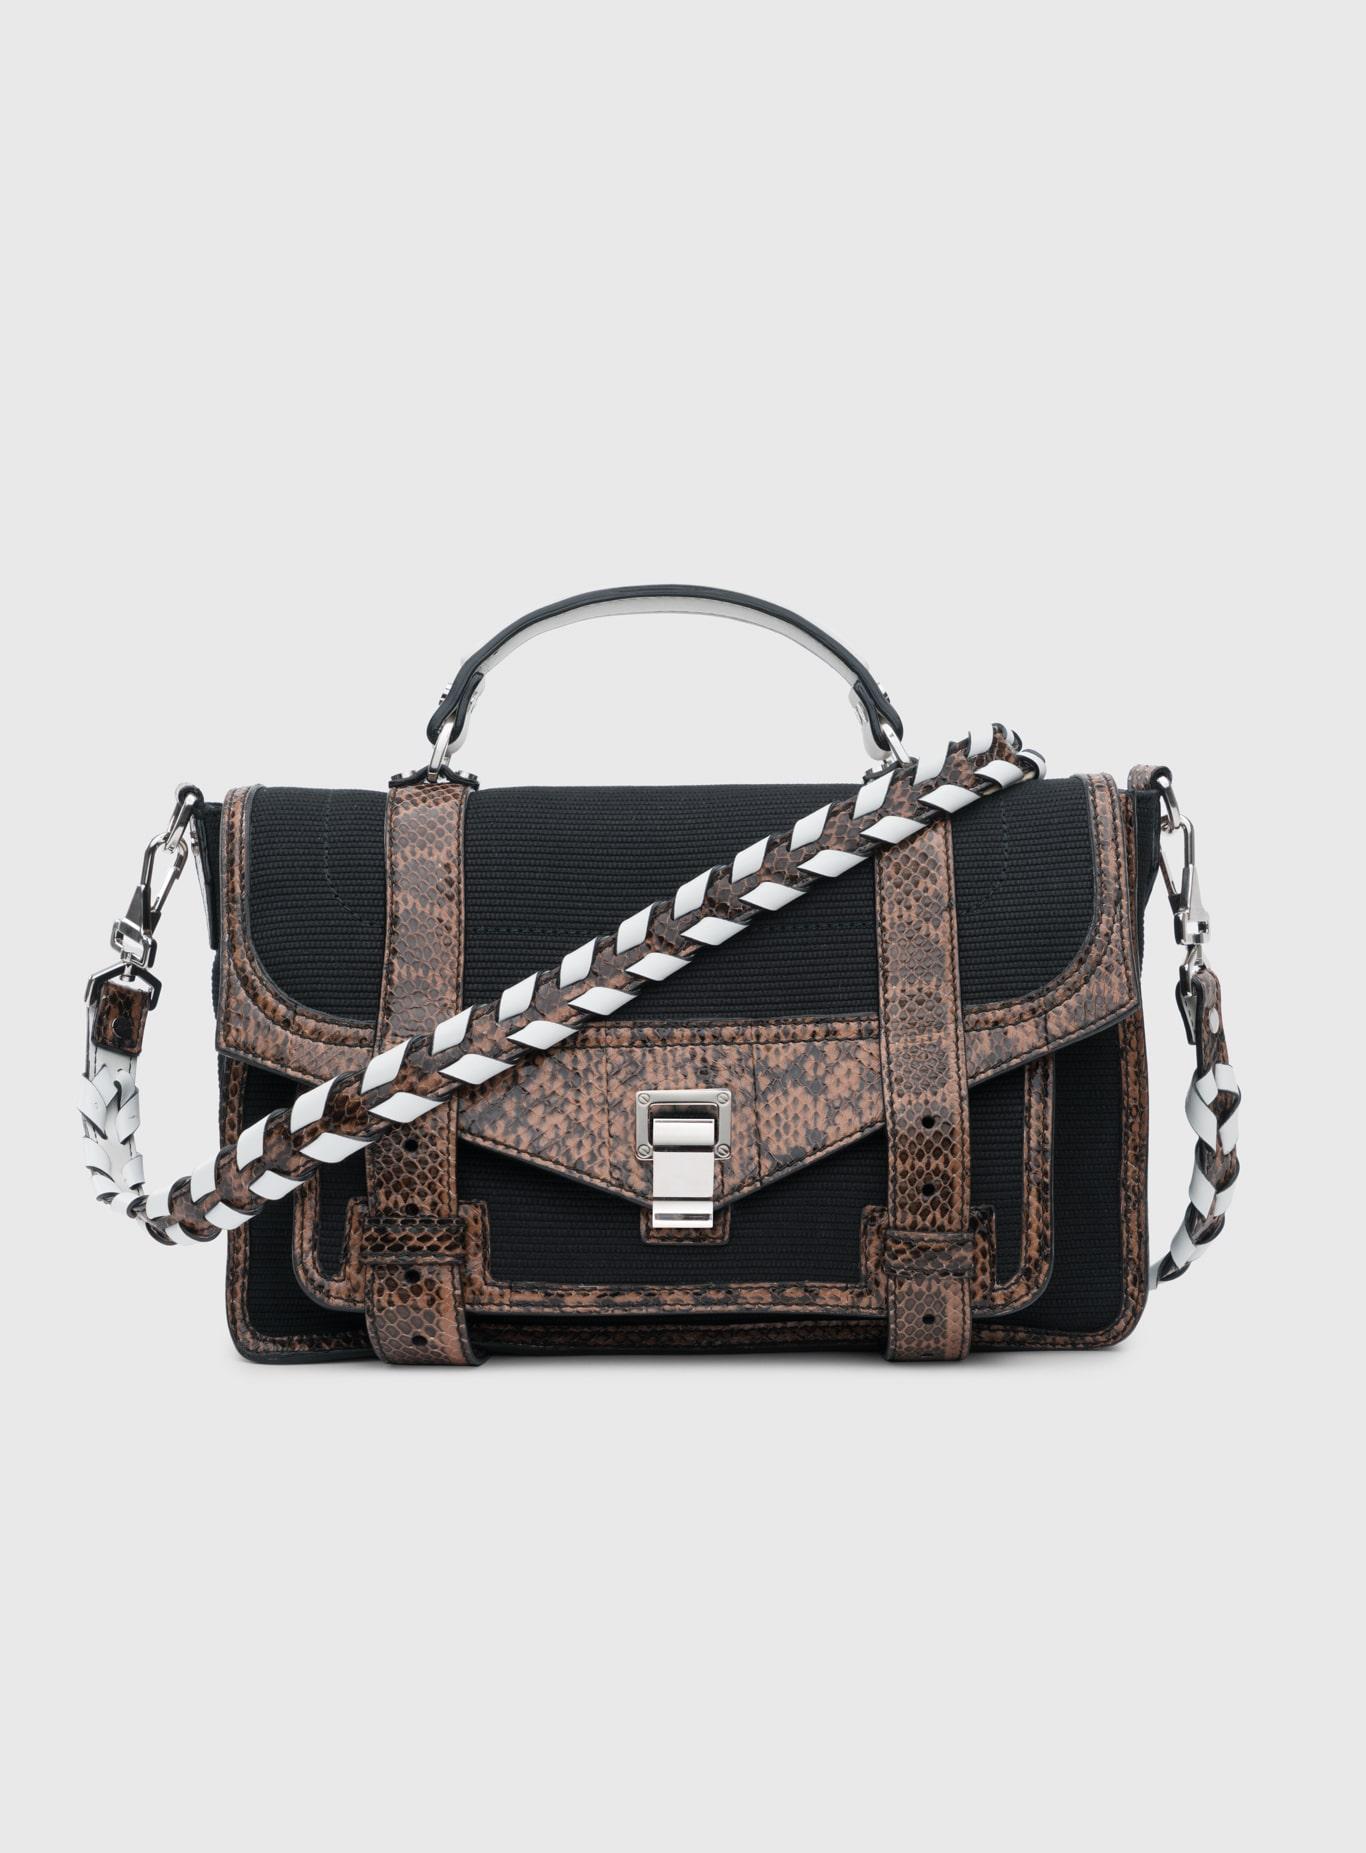 5d51e846da Proenza Schouler Resort 2017 Bag Collection | Spotted Fashion